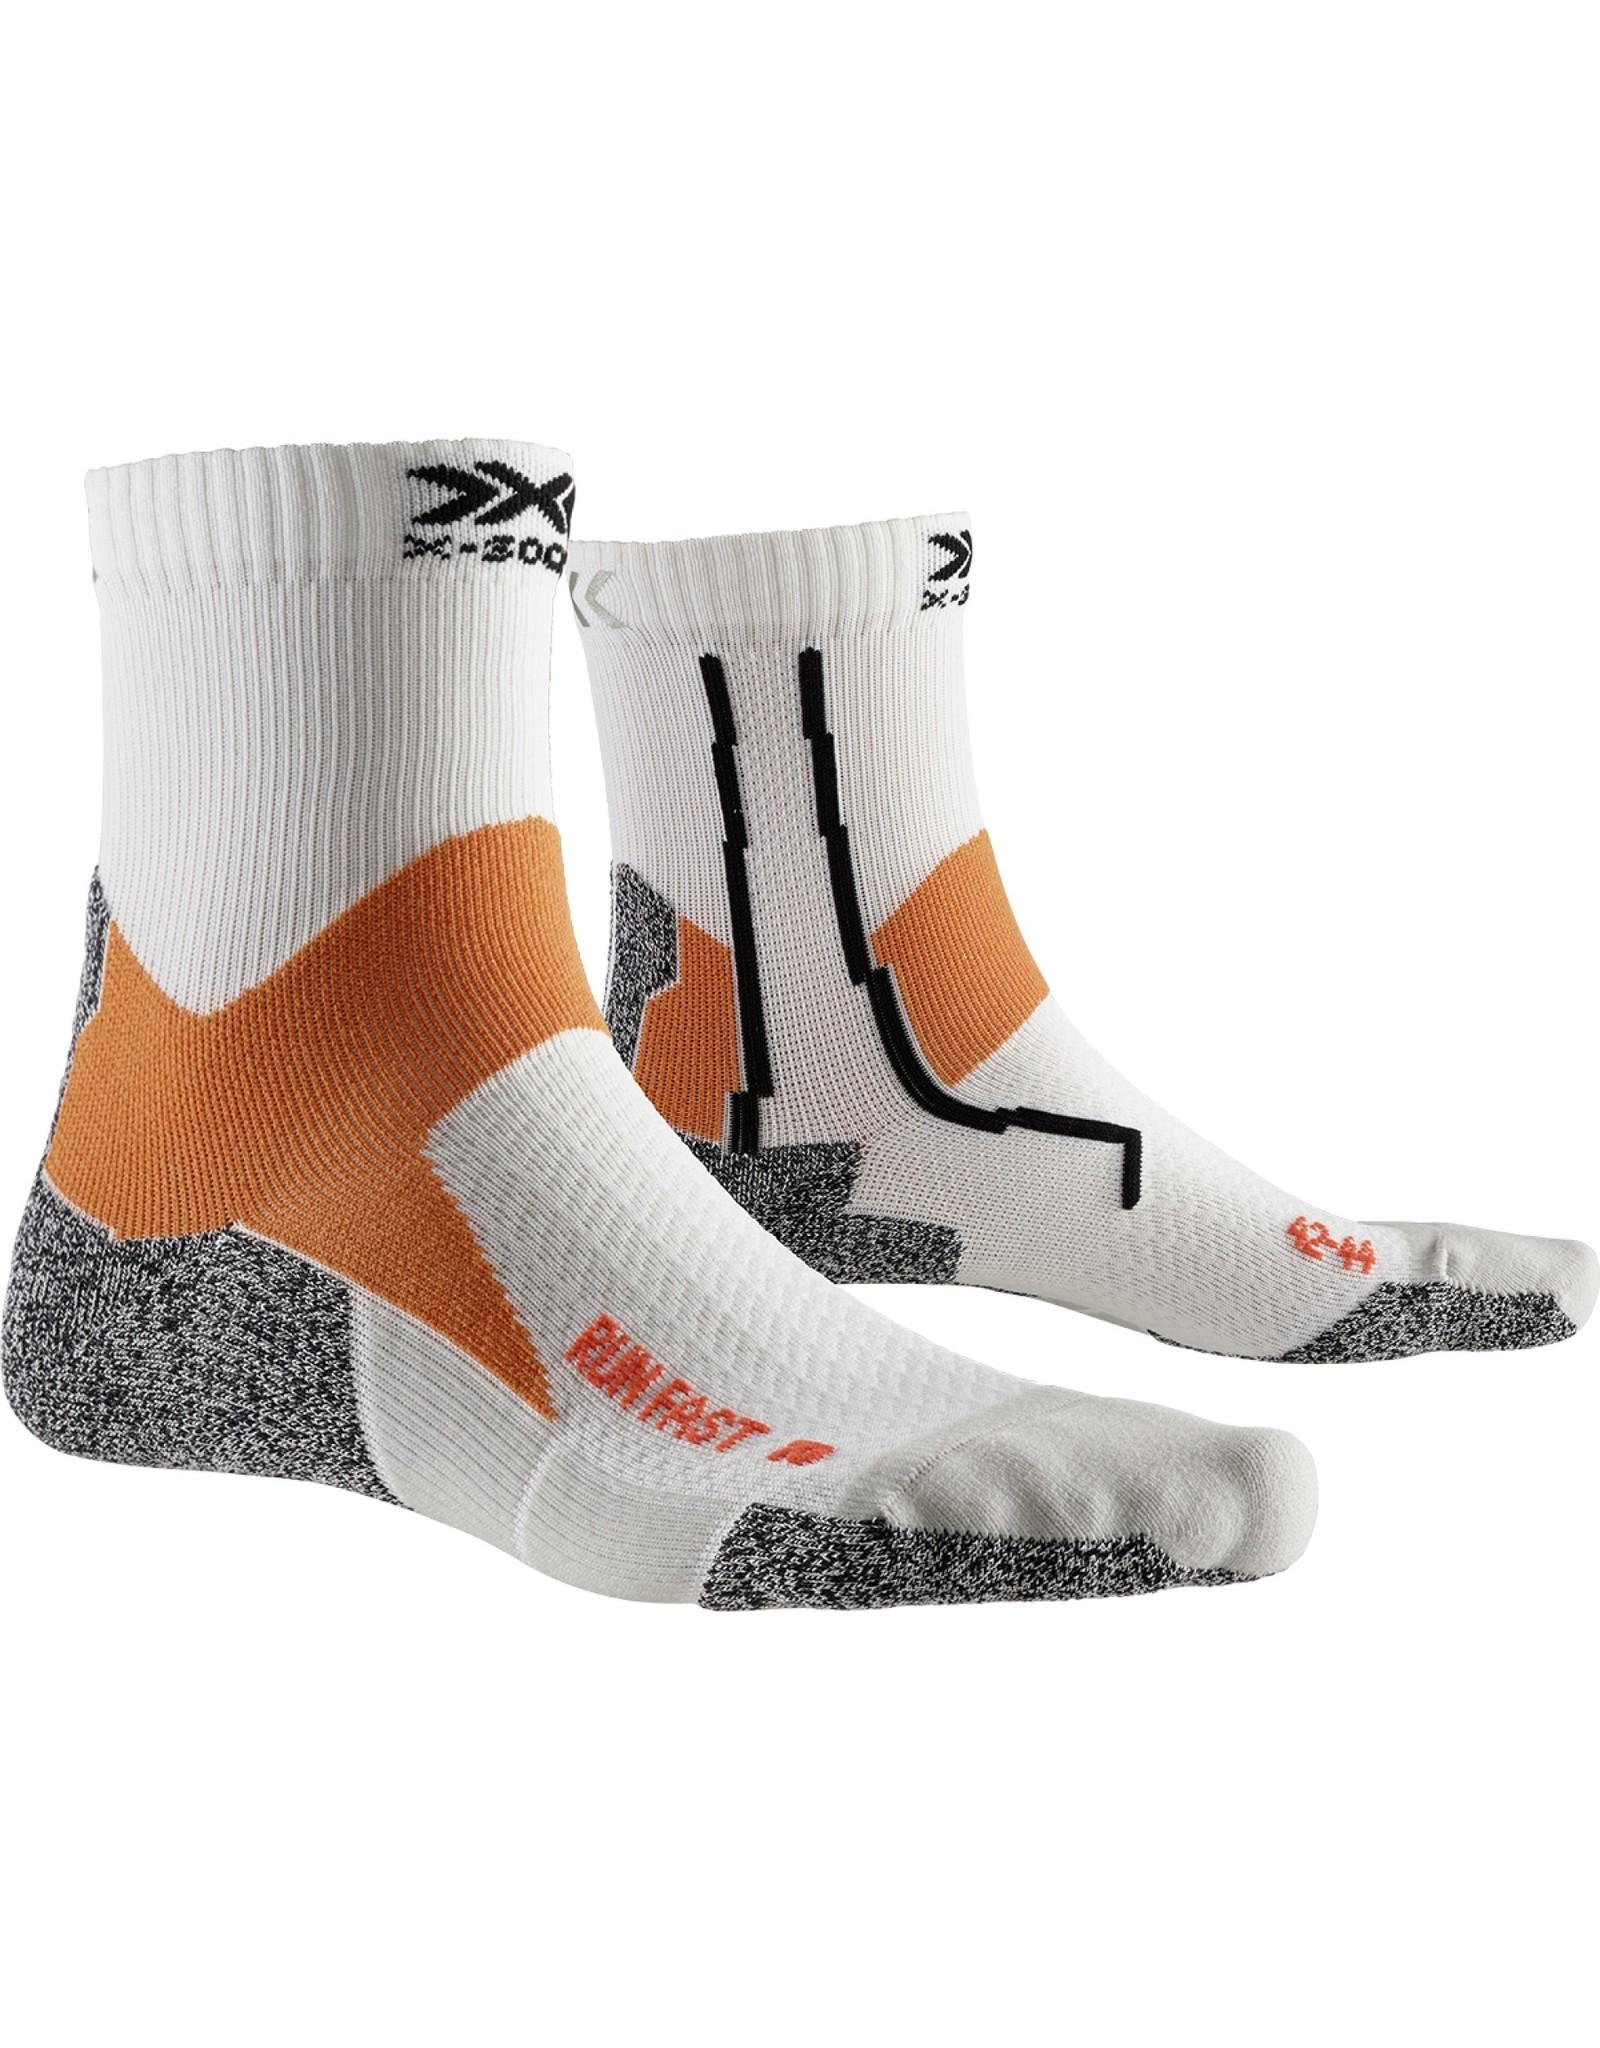 X-socks Run Fast Socks-white/orange